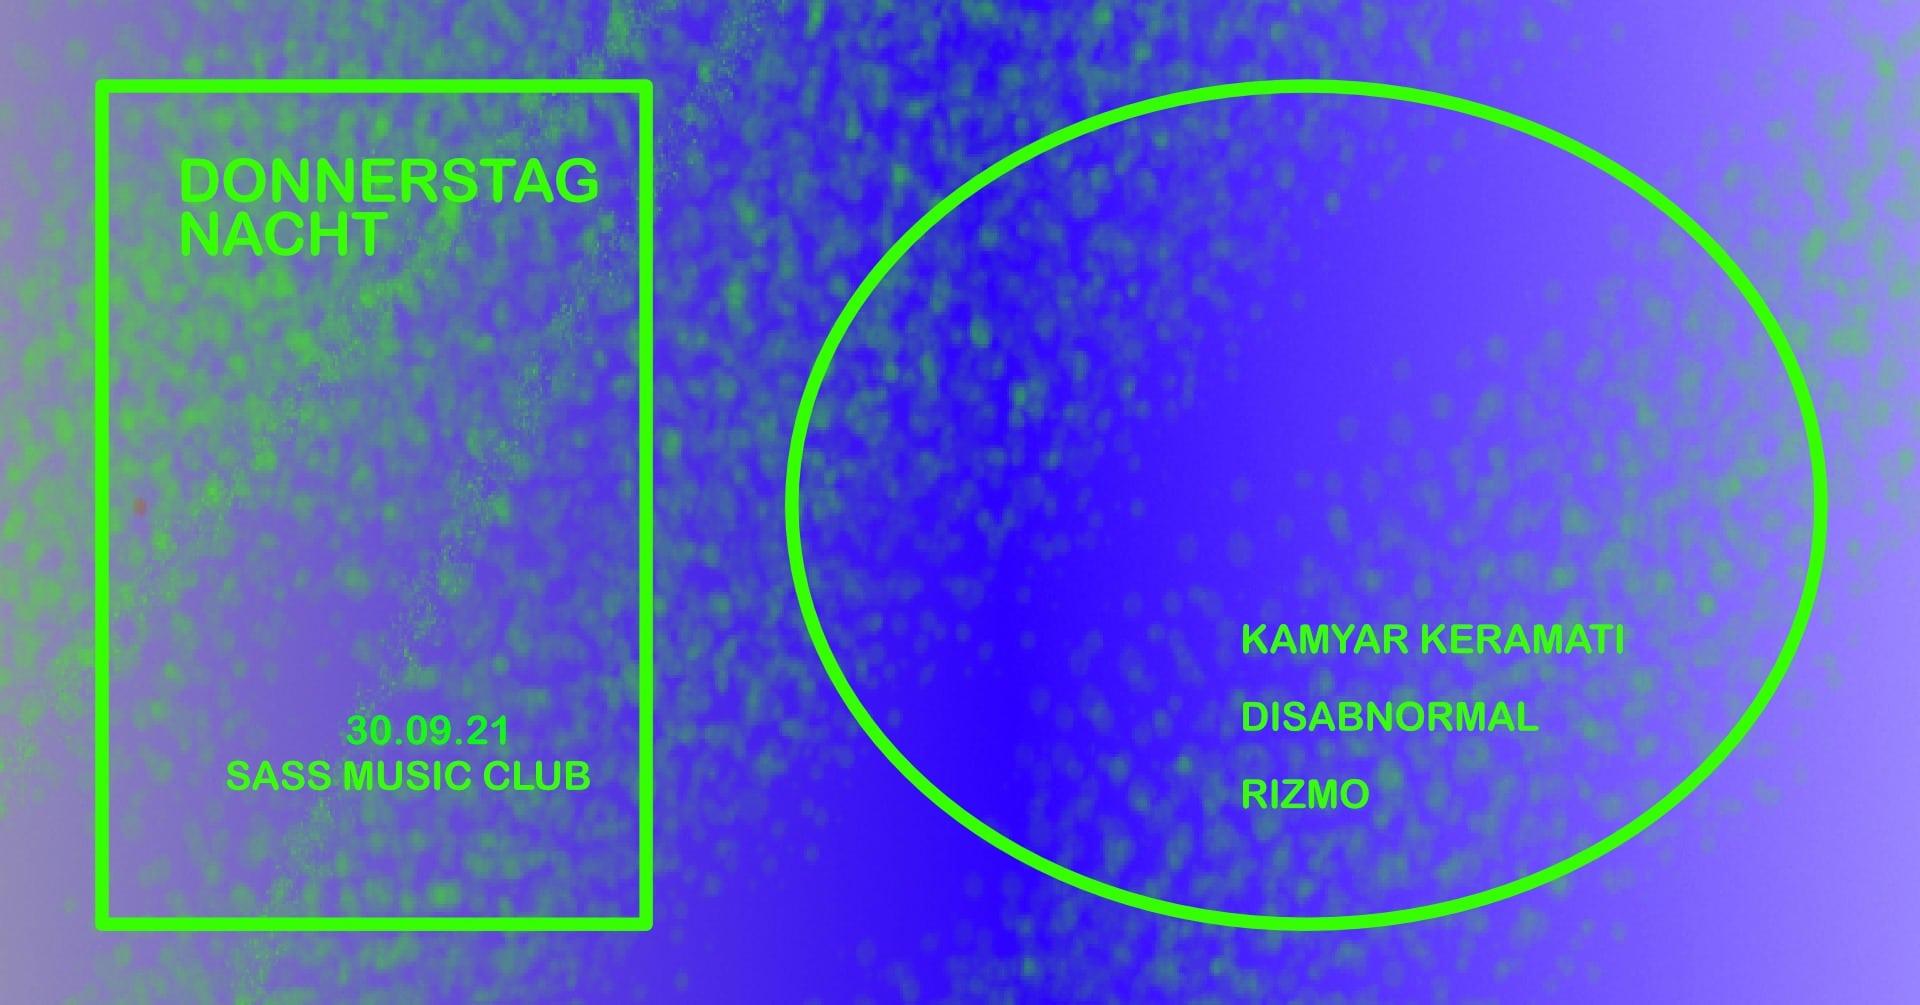 Events Wien: DONNERSTAG NACHT W/KAMYAR KERAMATI